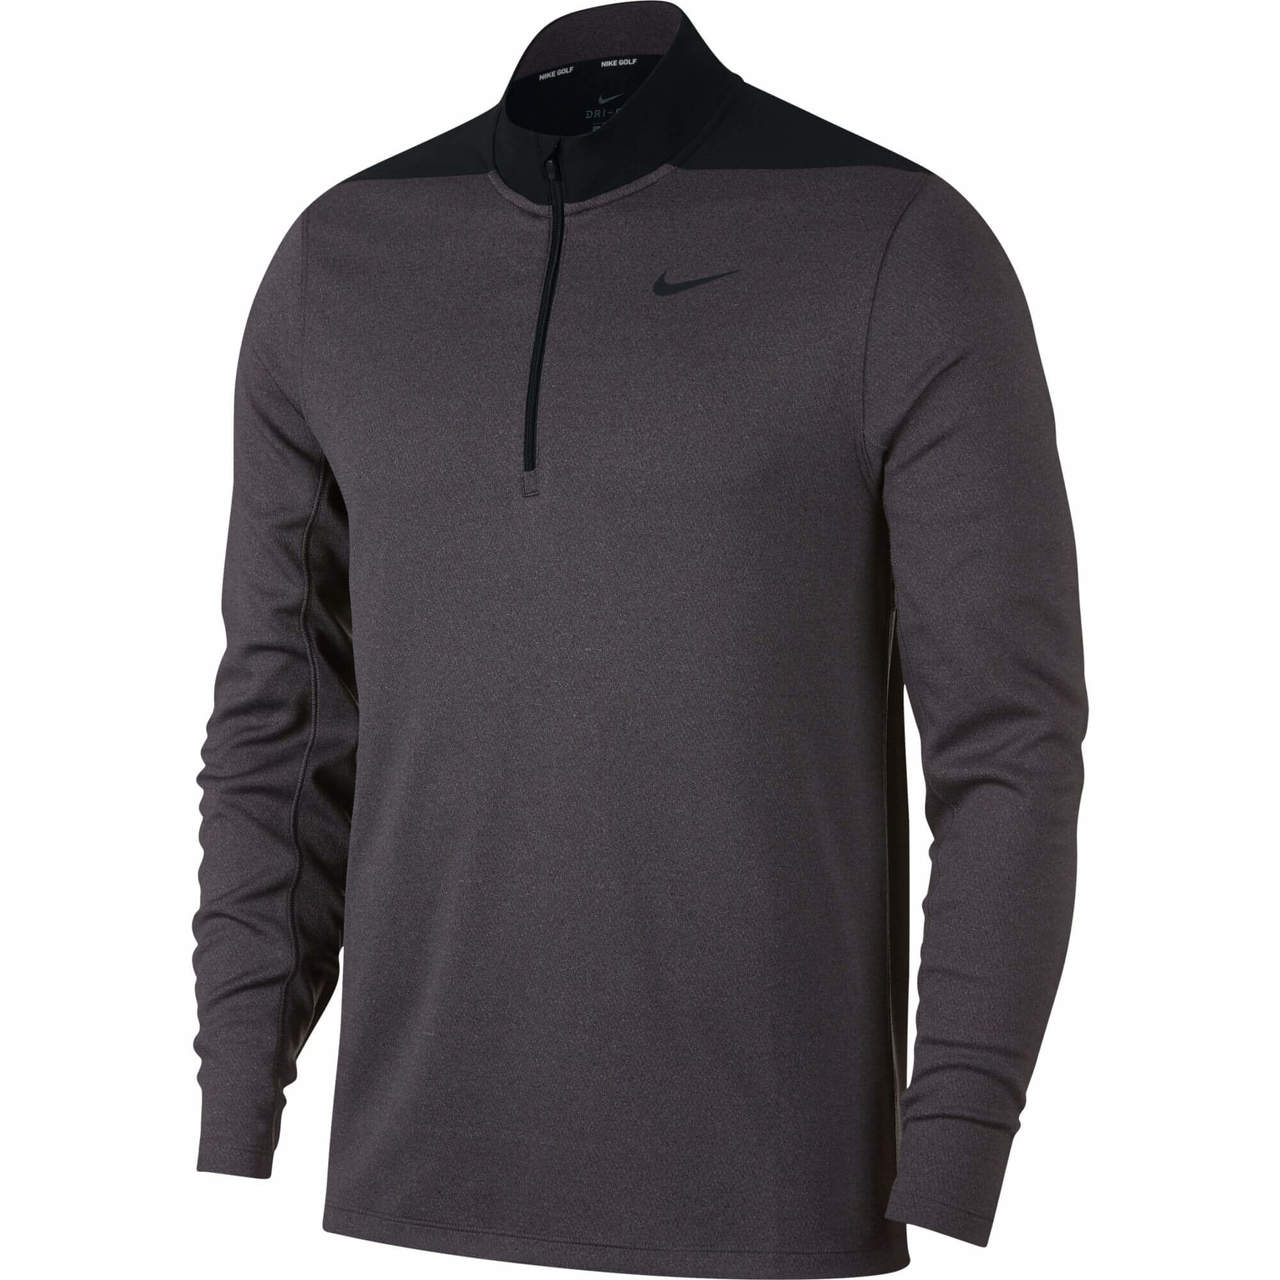 8f94ecca7add Shop Nike Dry Core Half-Zip Men s Golf Top